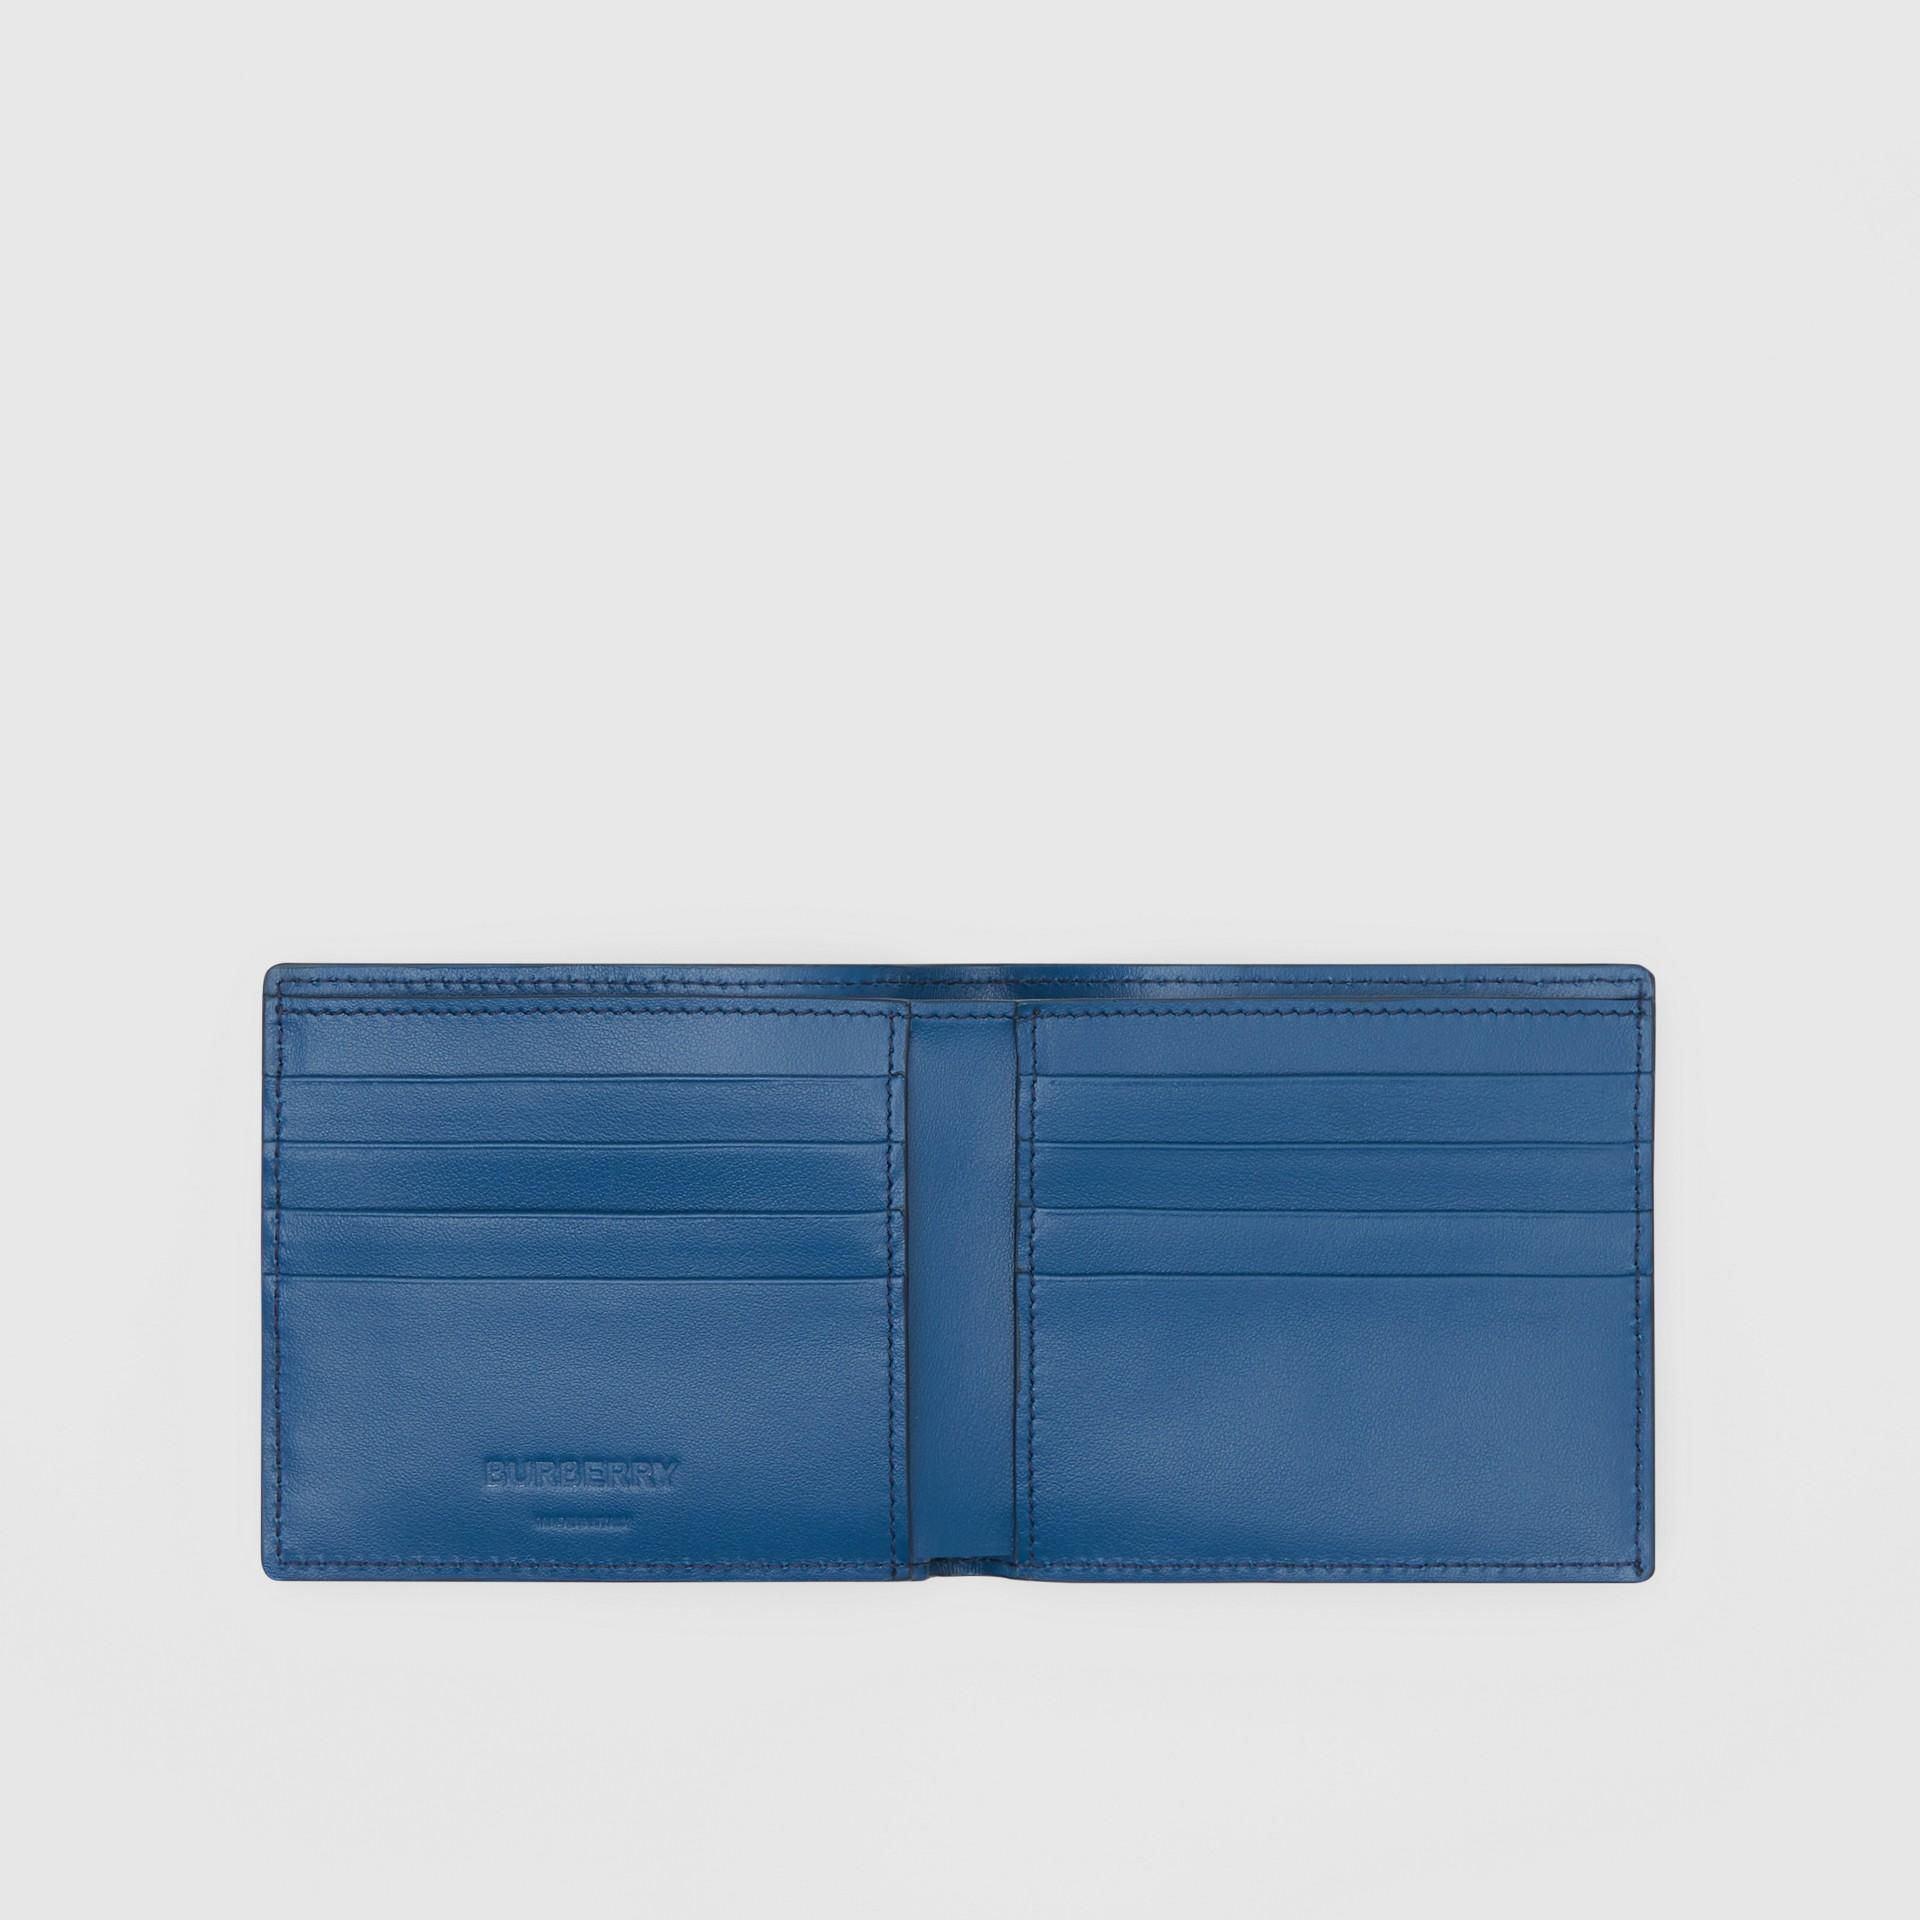 Monogram Leather International Bifold Wallet in Pale Canvas Blue - Men   Burberry - gallery image 2